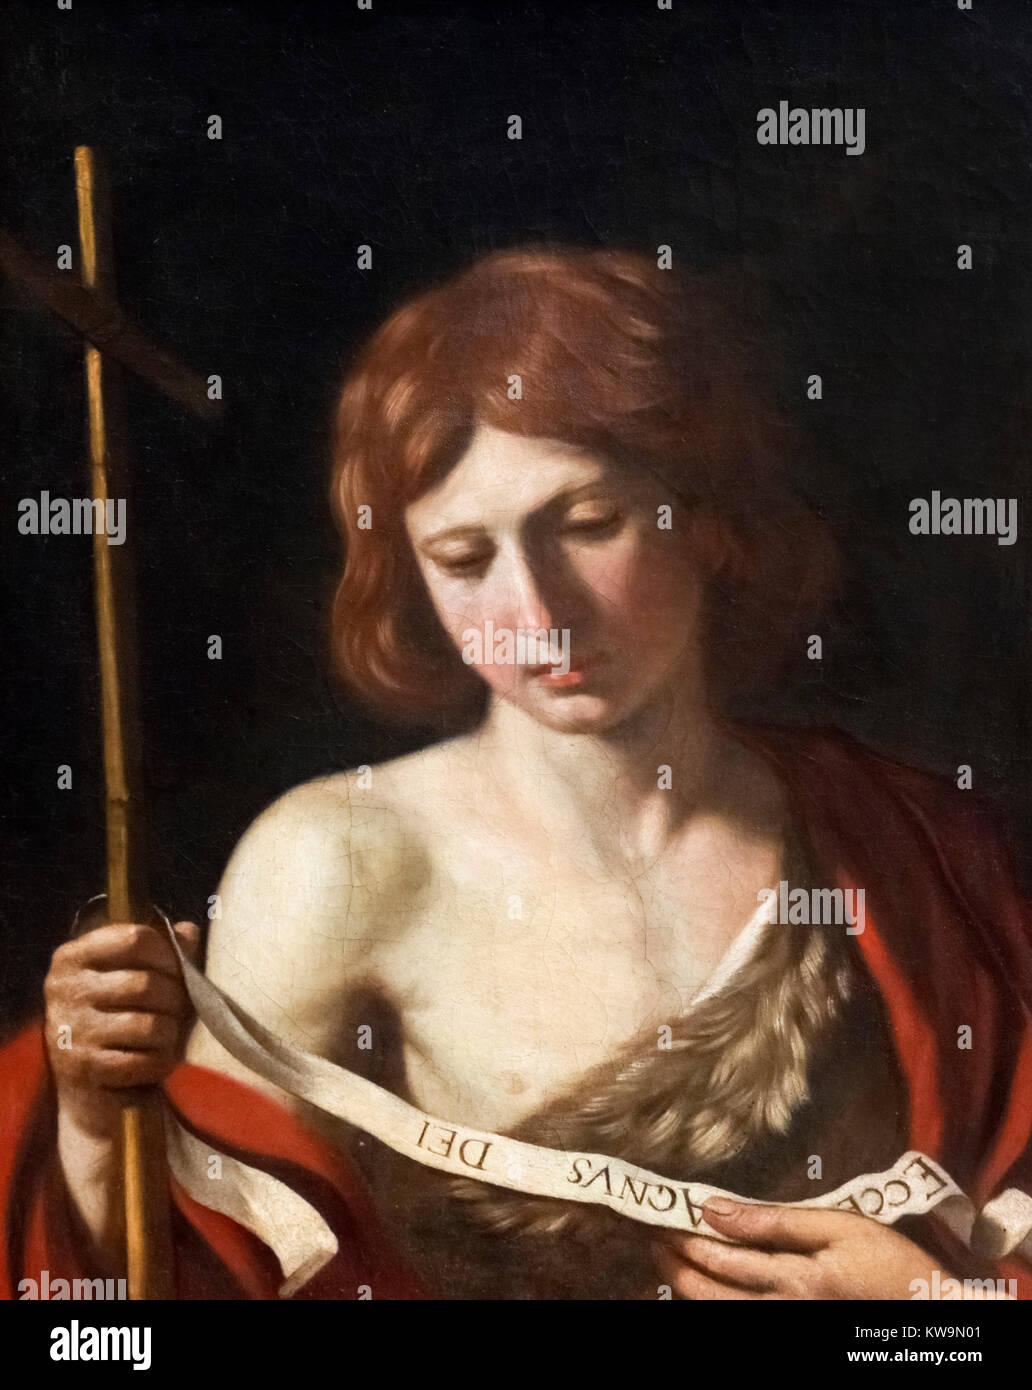 St John the Baptist by Il Guercino (Giovanni Francesco Barbieri, 1591-1666), oil on canvas, 1645 - Stock Image